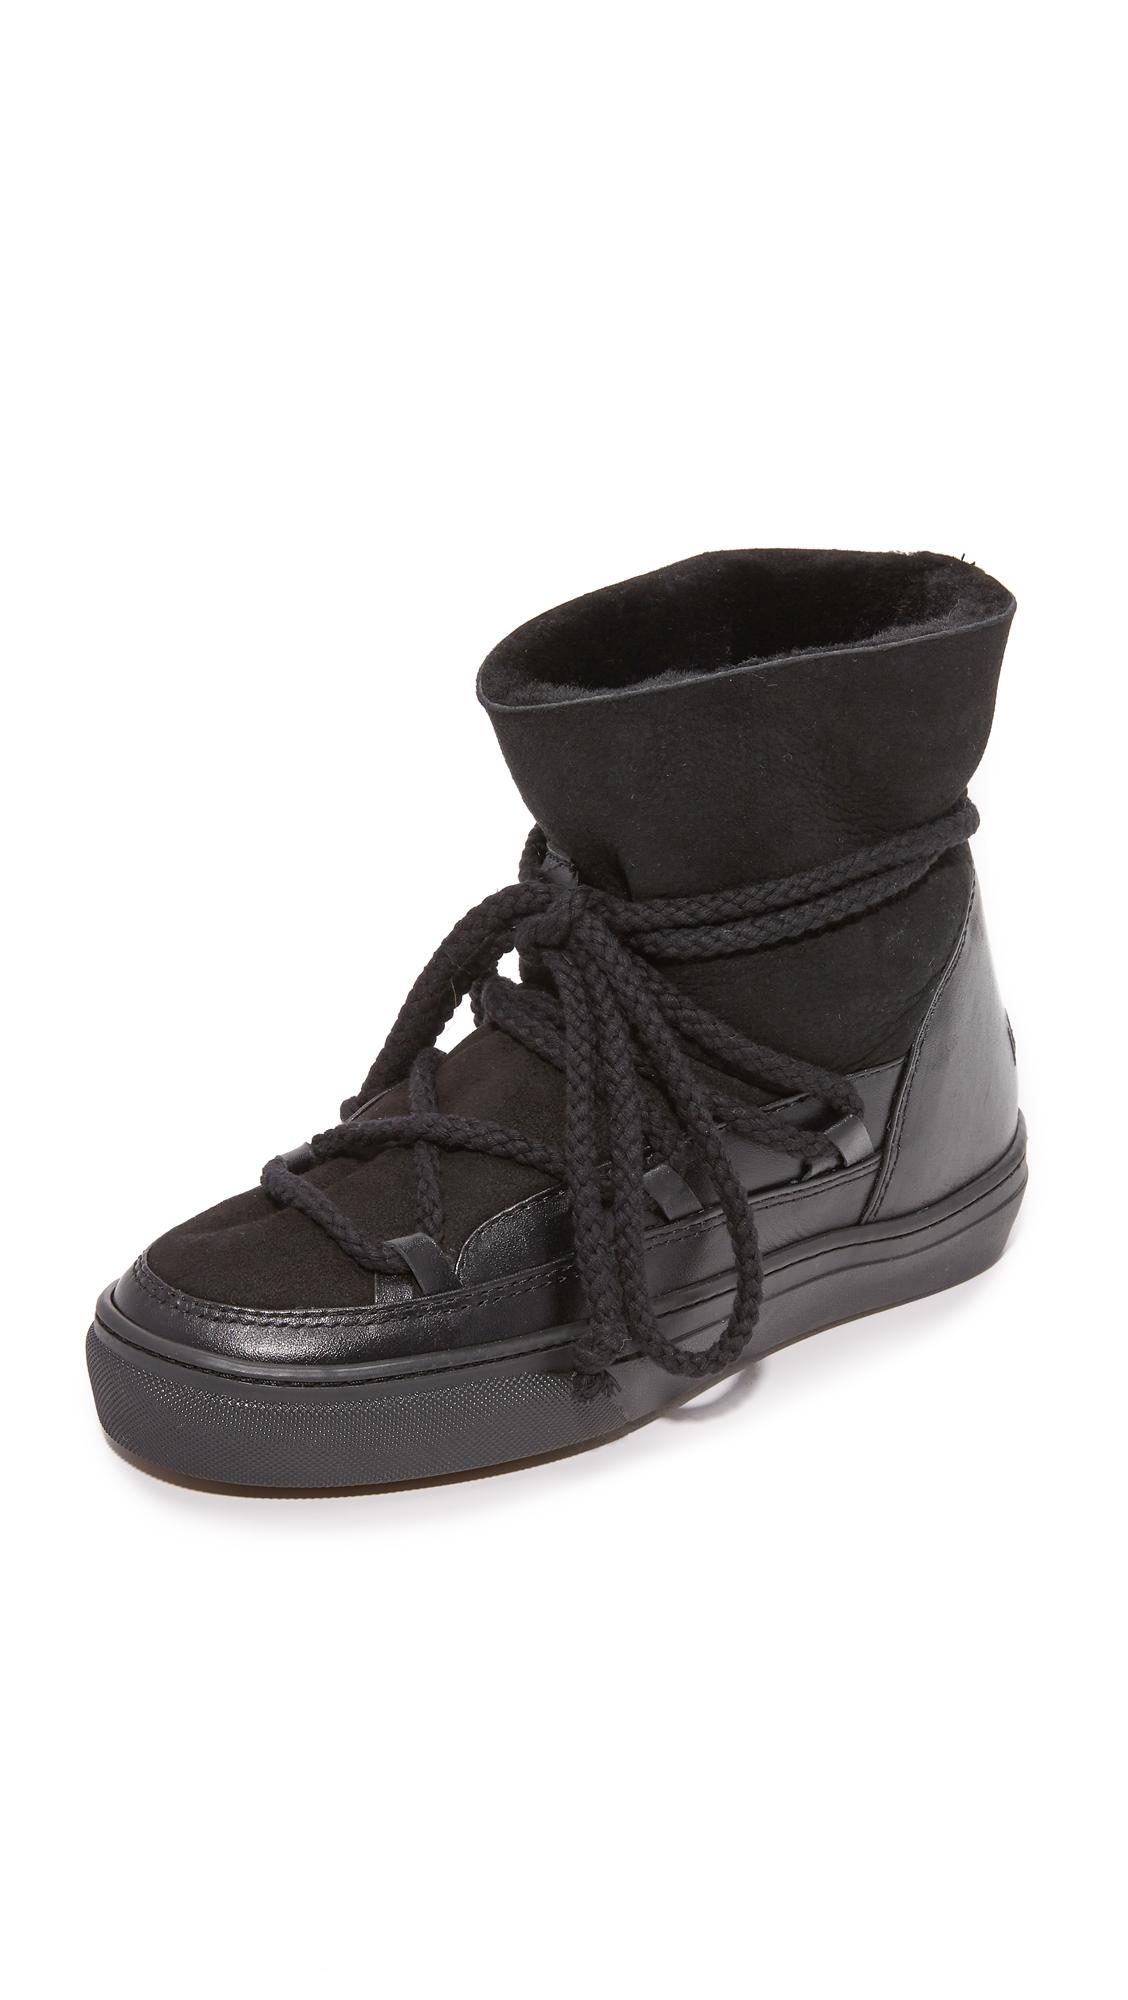 Inuiki Classic Sneaker Booties - Black